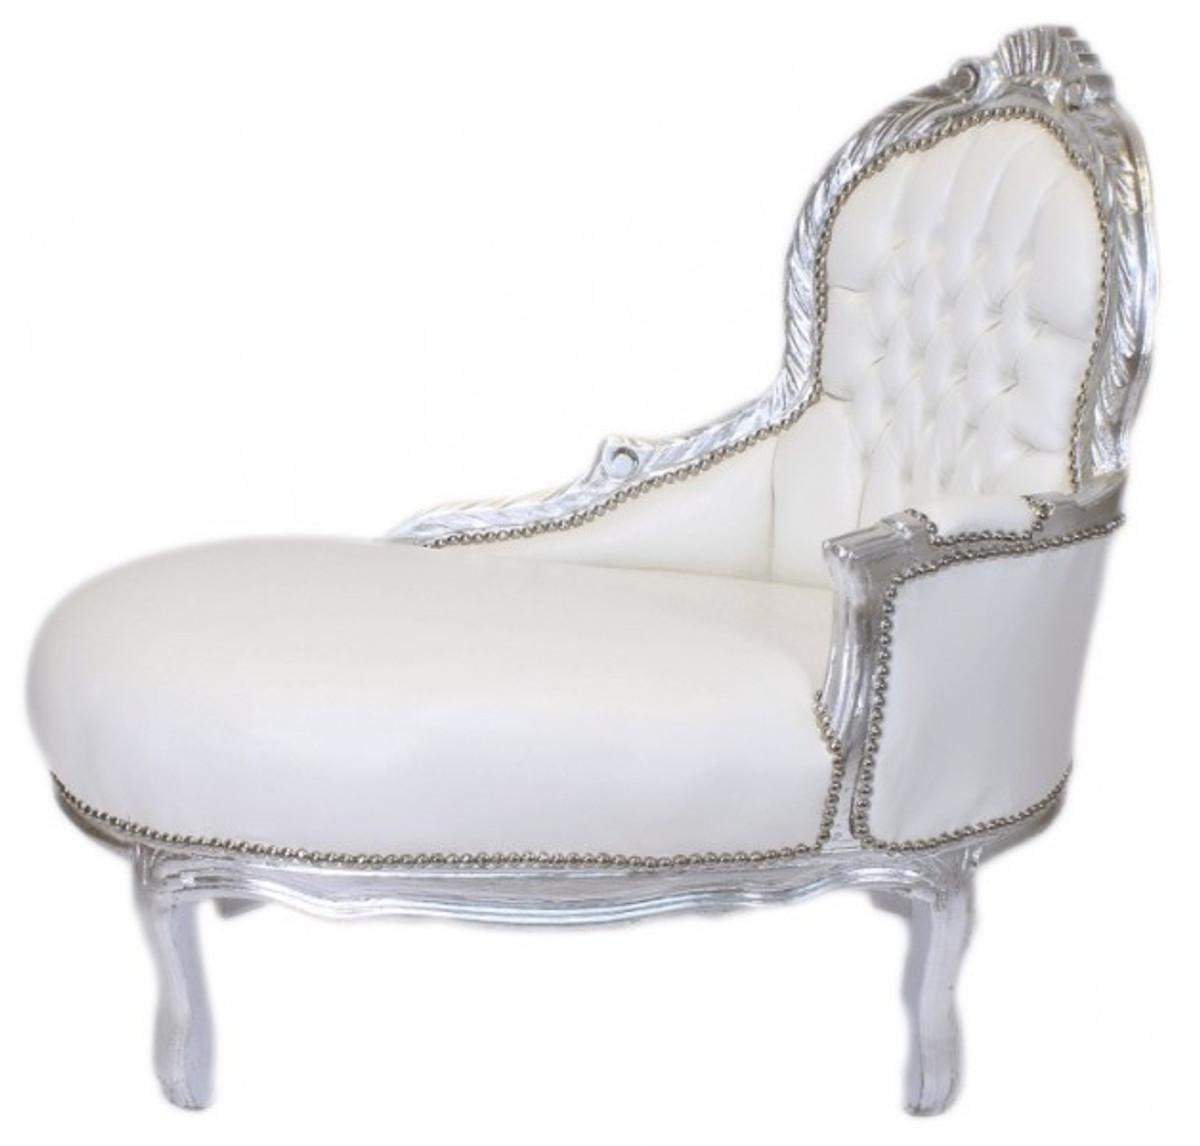 casa padrino barock kinder chaiselongue wei lederoptik silber mod2 barock m bel casa. Black Bedroom Furniture Sets. Home Design Ideas